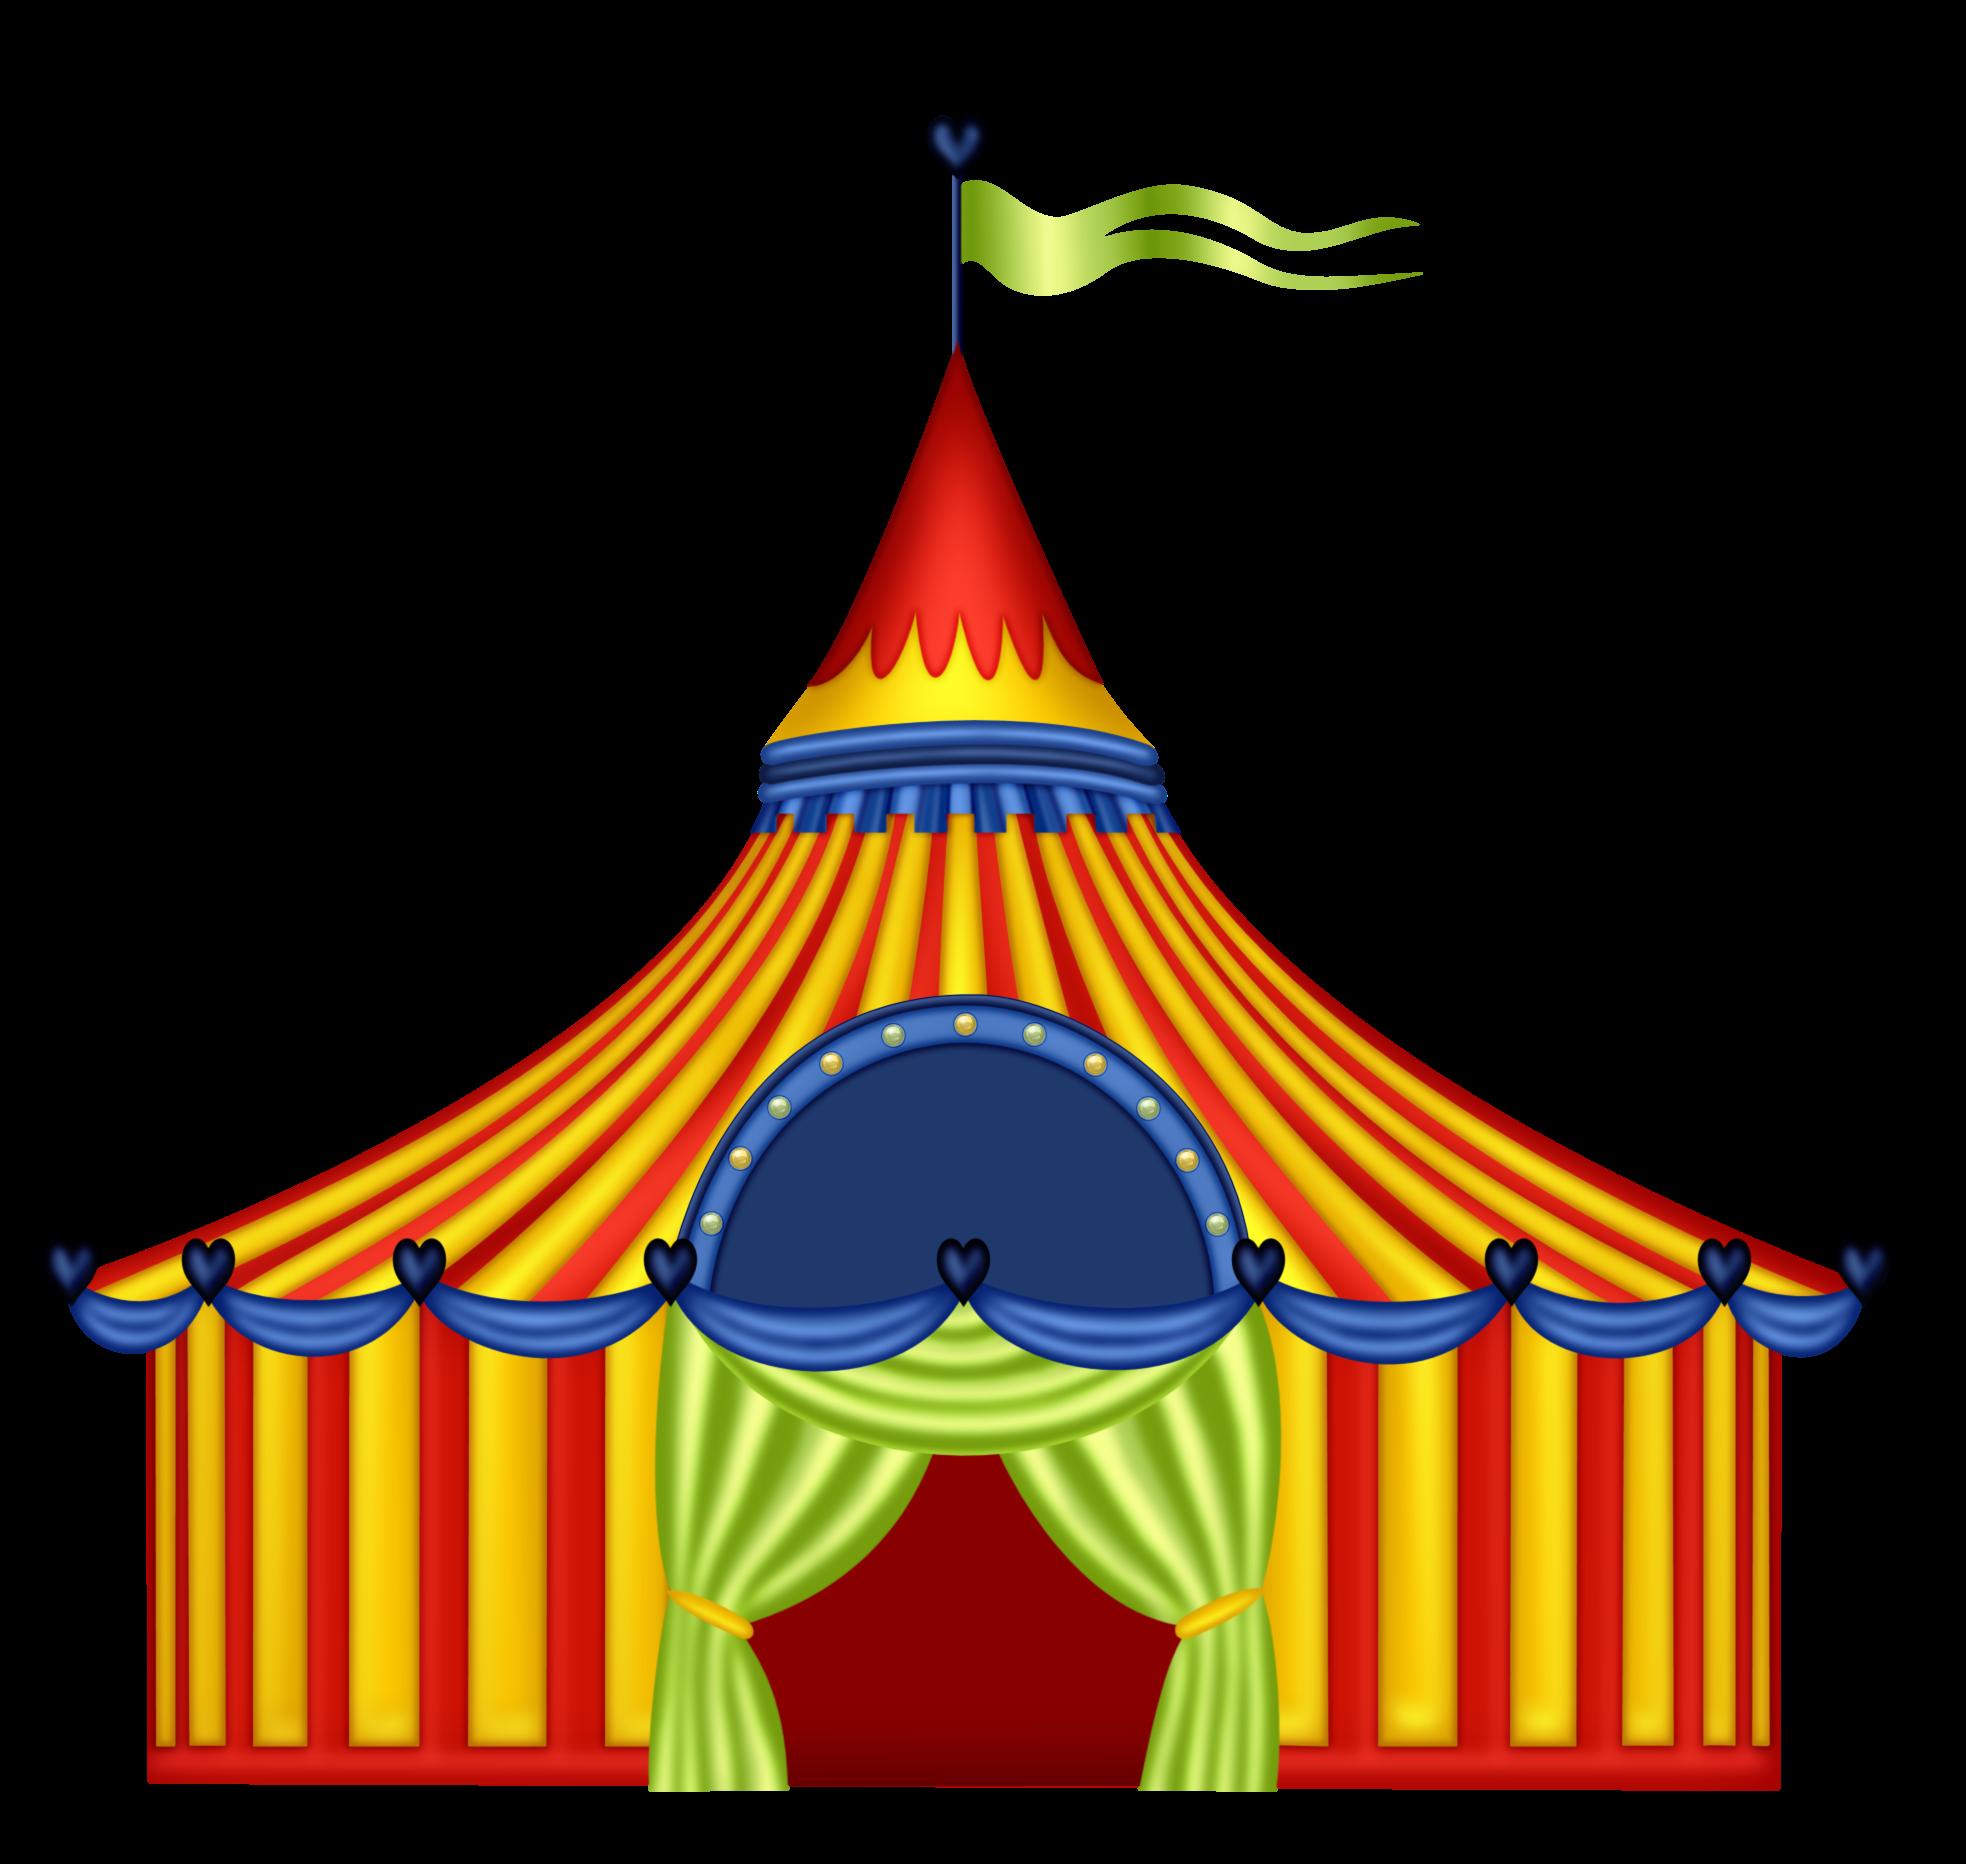 Circo png pesquisa google. Number 1 clipart circus